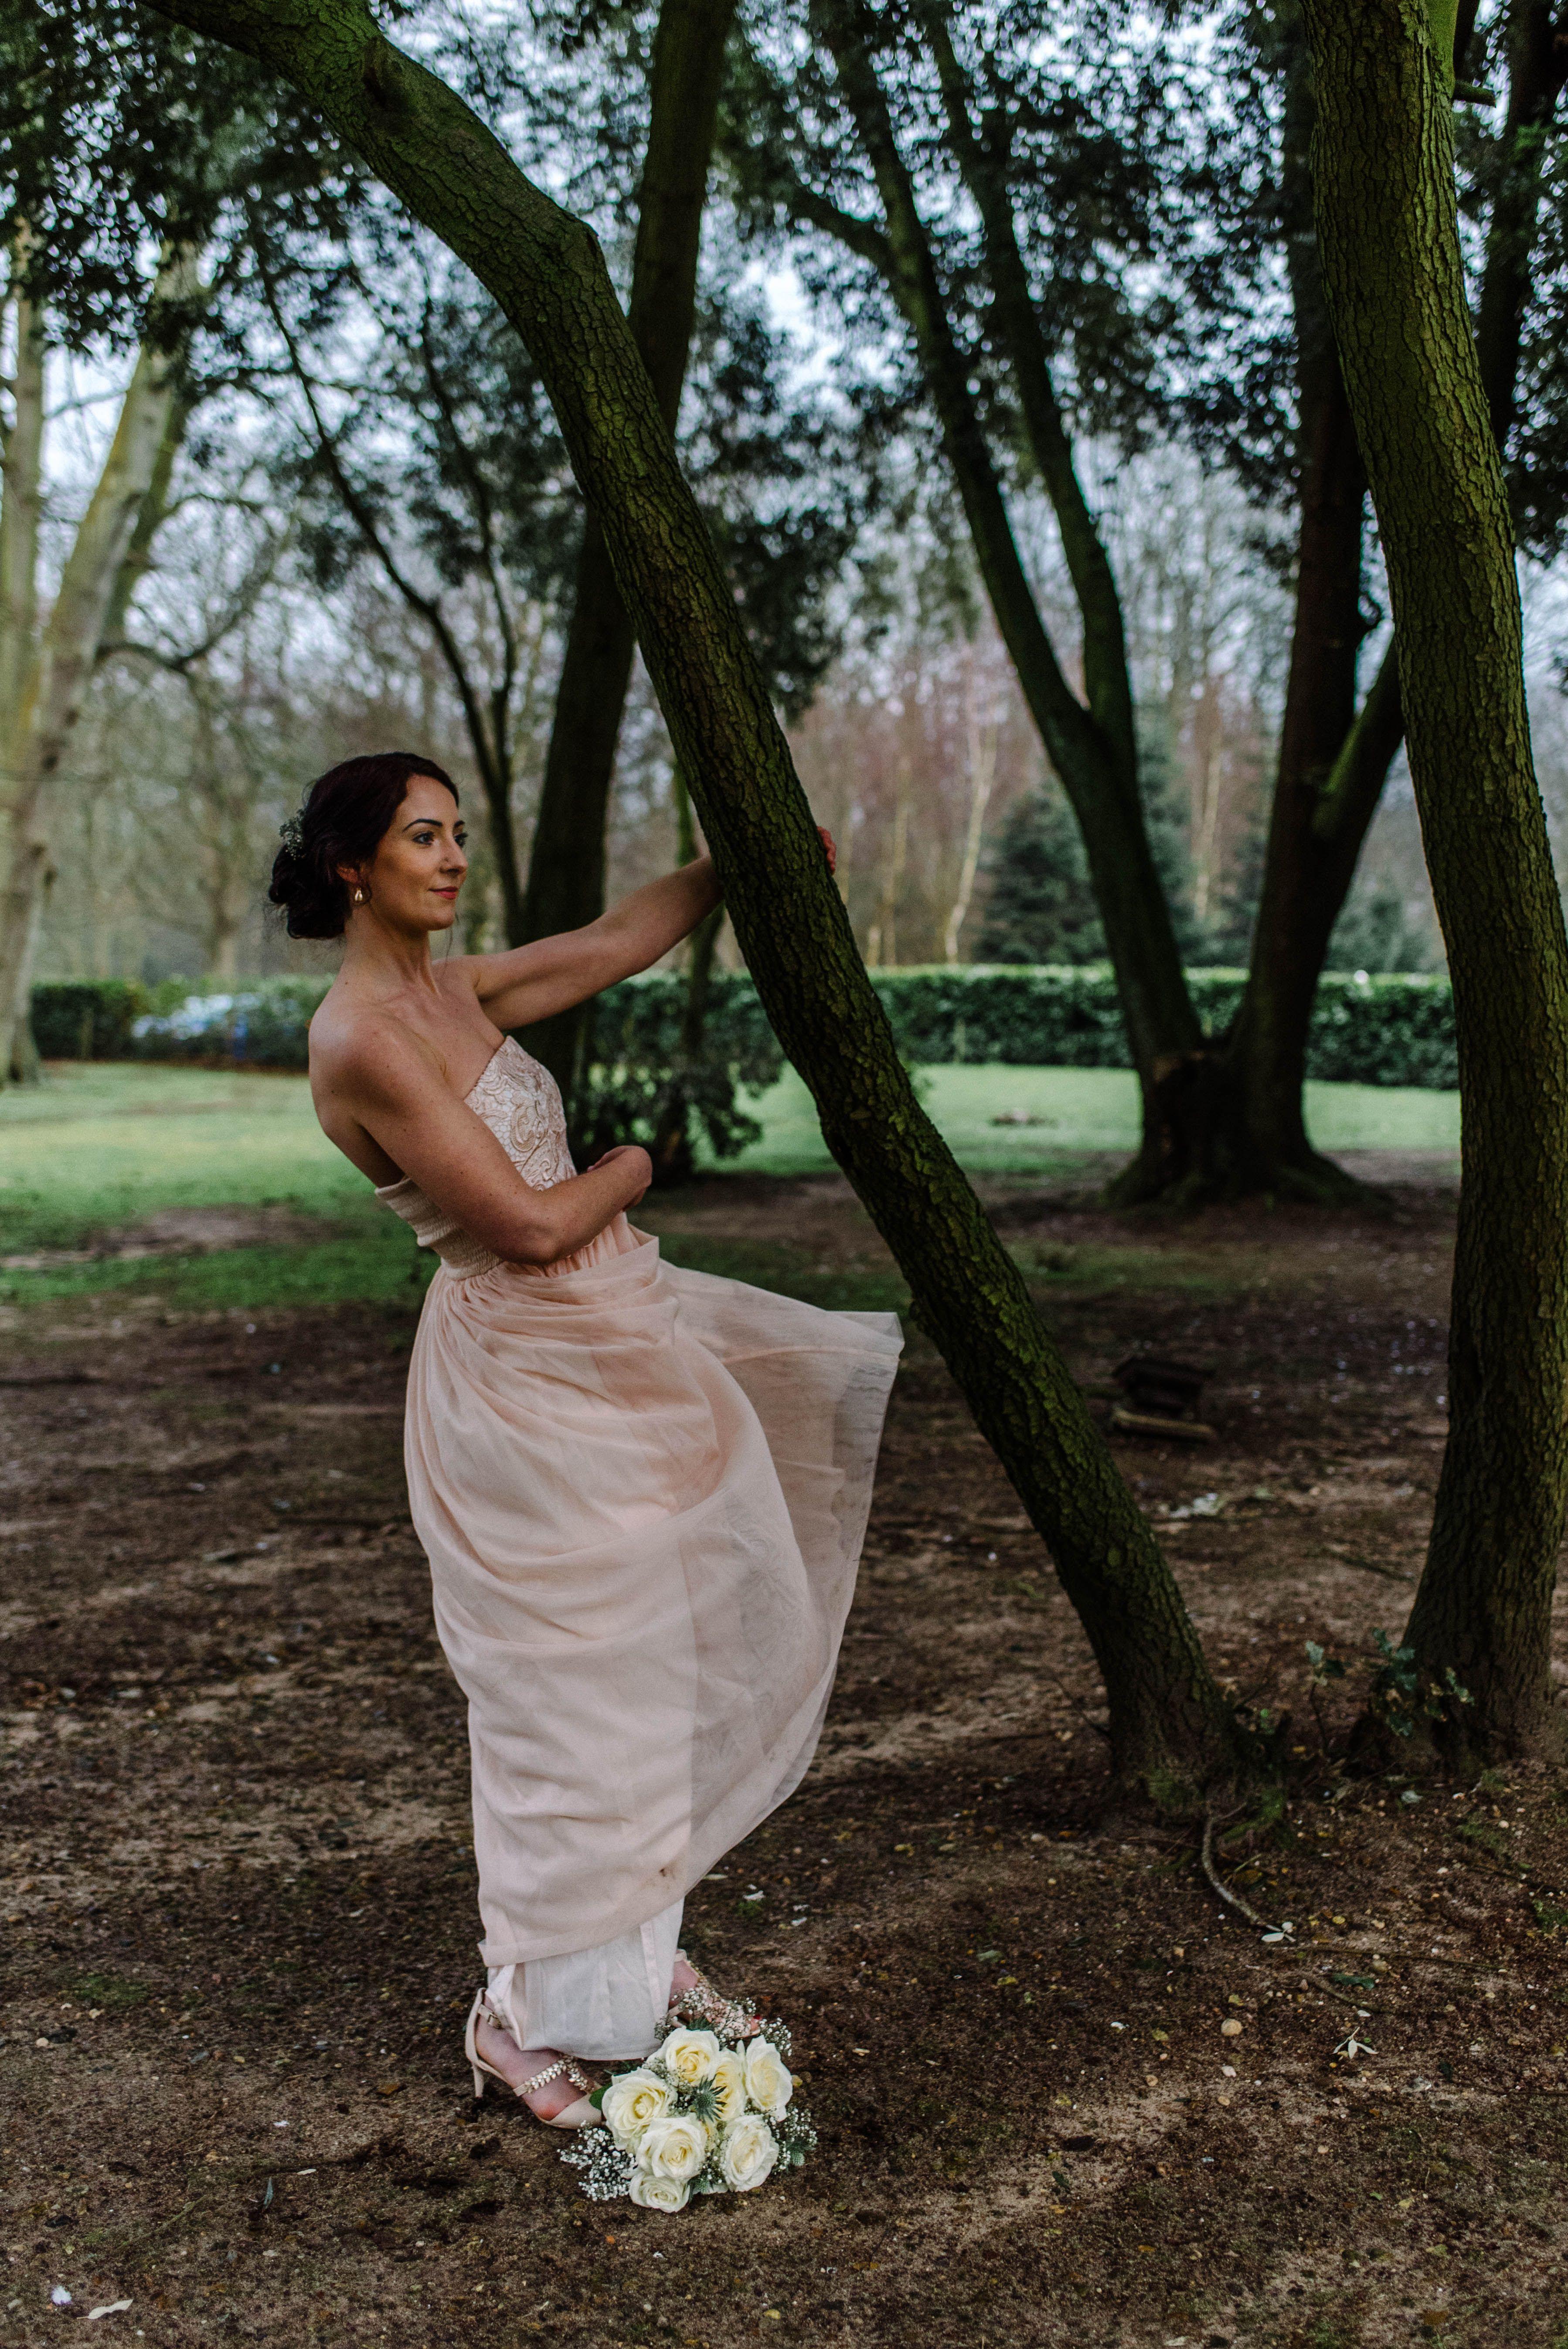 Wedding photography ideas, laura alison photography, laura